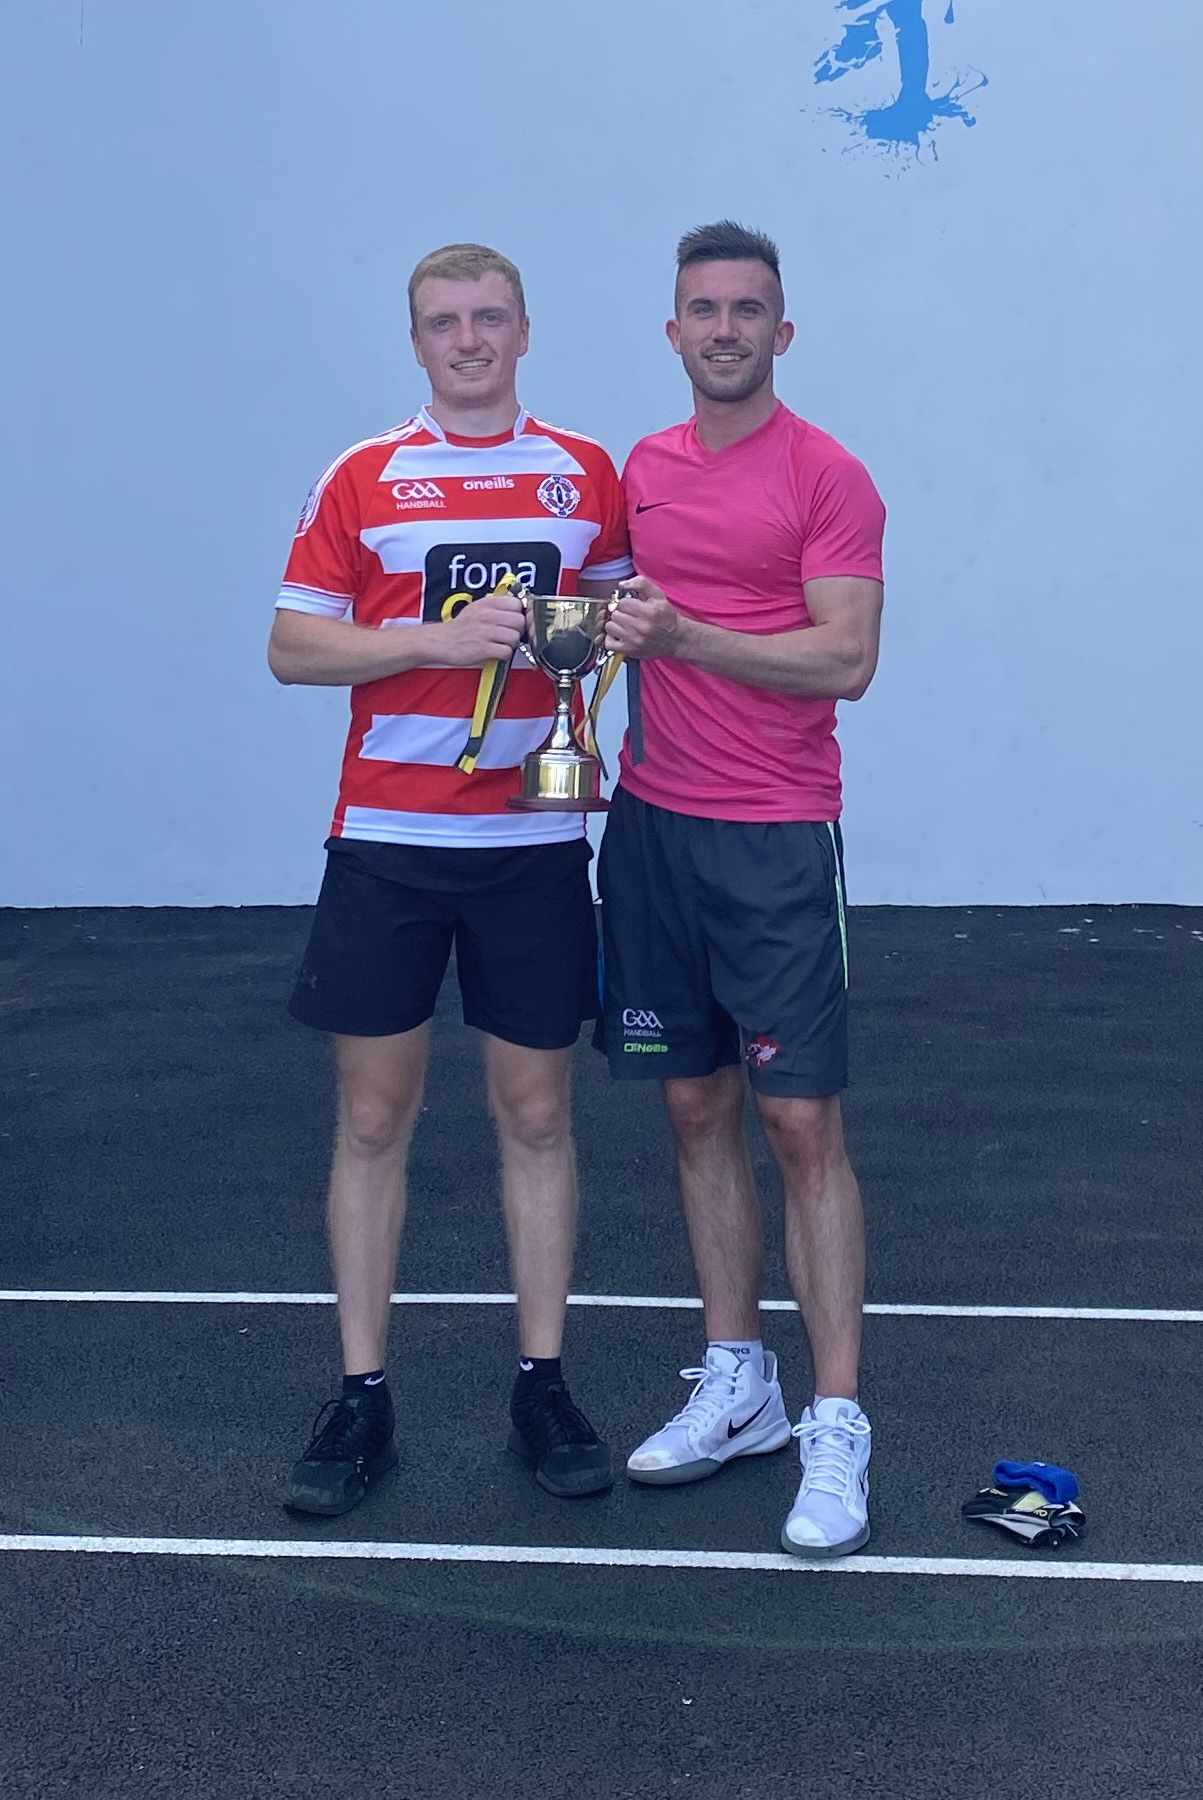 Beaten finalist Jordan O'Neill with winner Conor McElduff